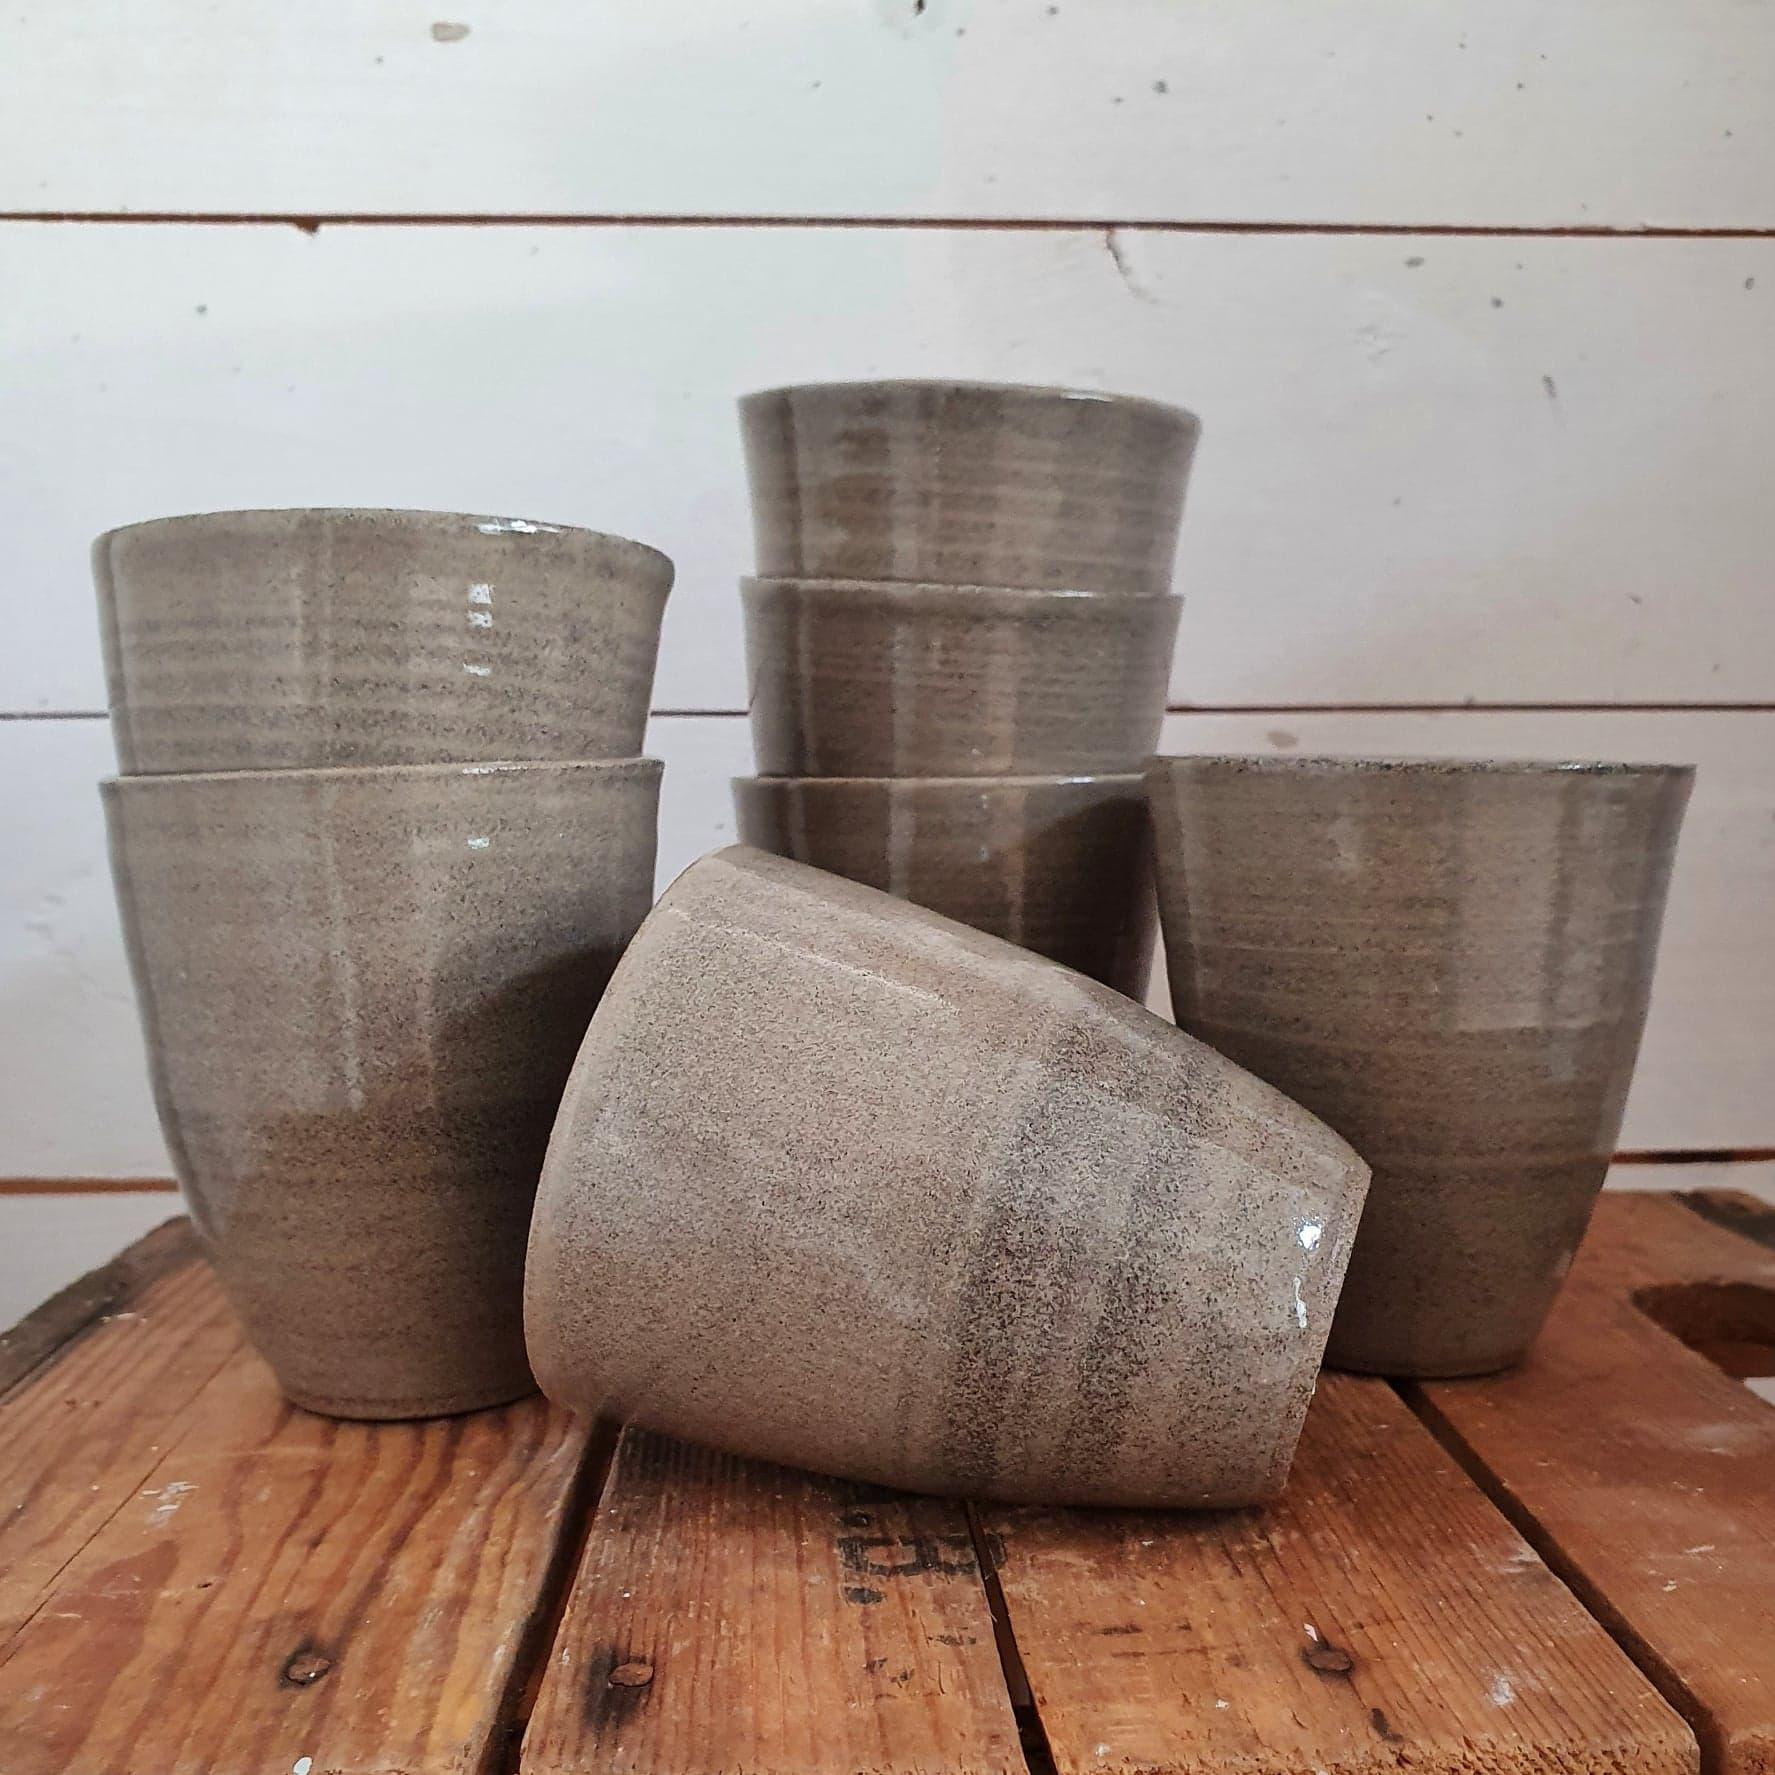 sandfärgade kaffekoppar utan öra i keramik